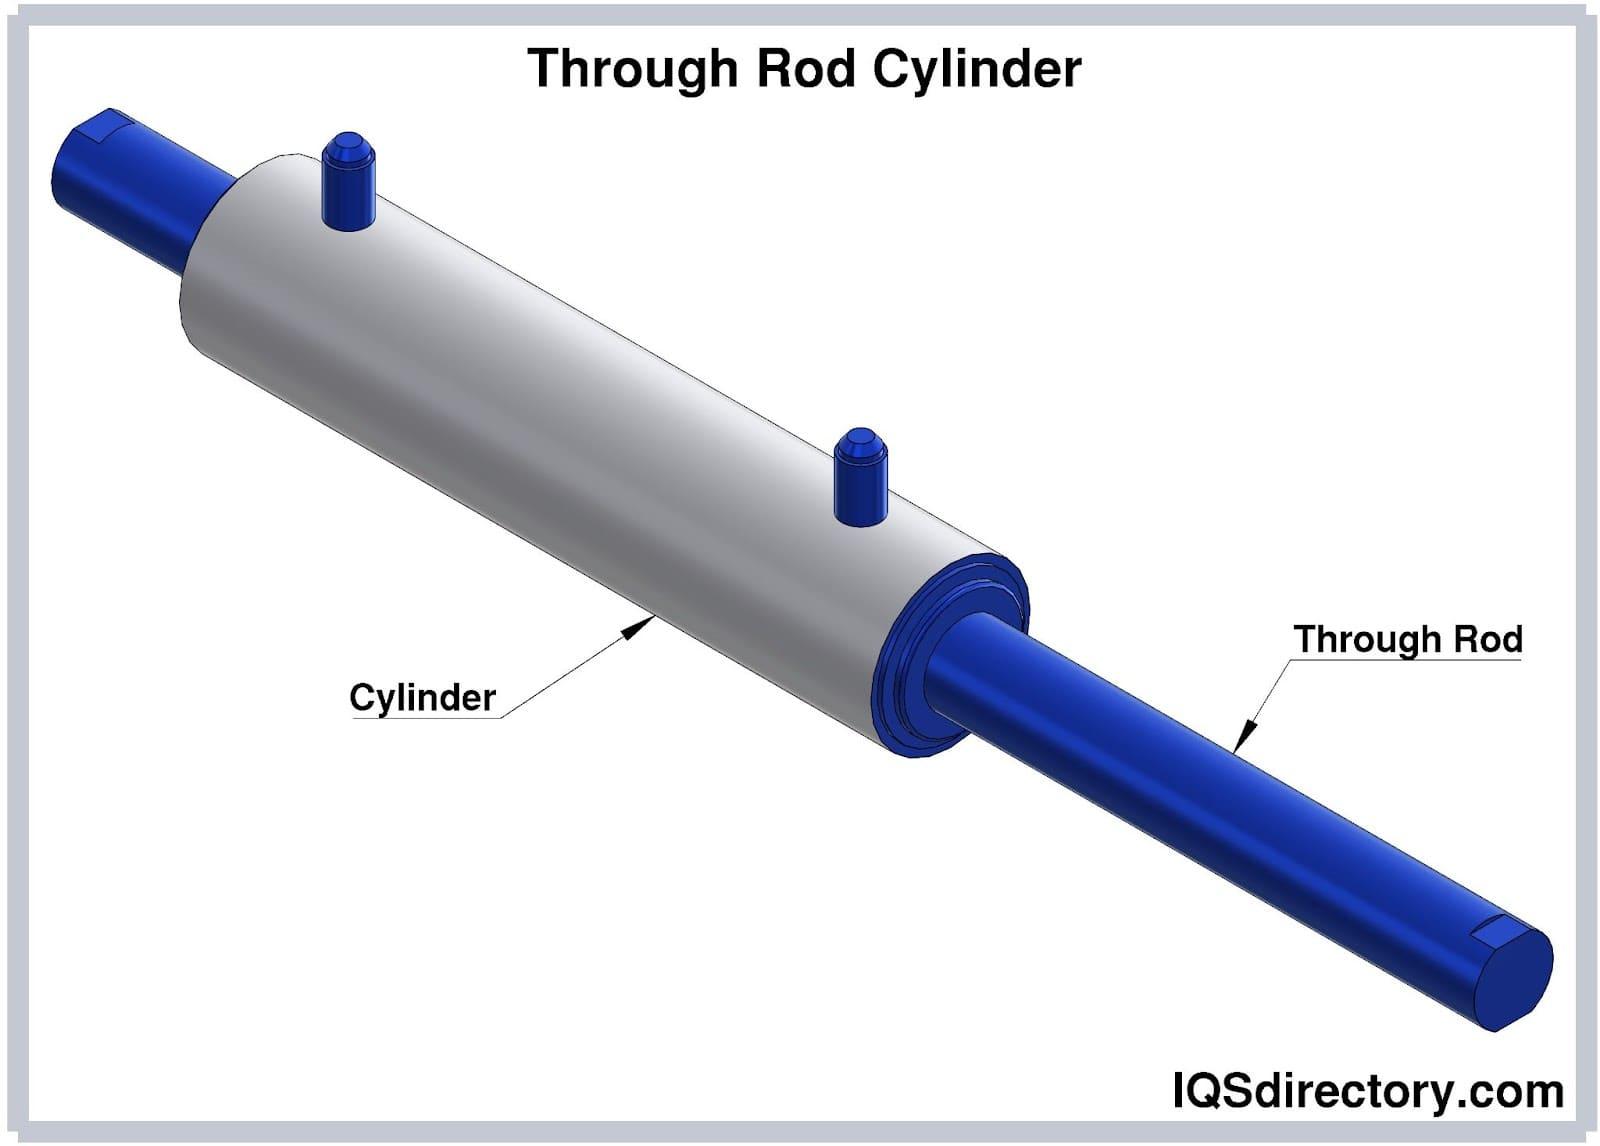 Through Rod Cylinder